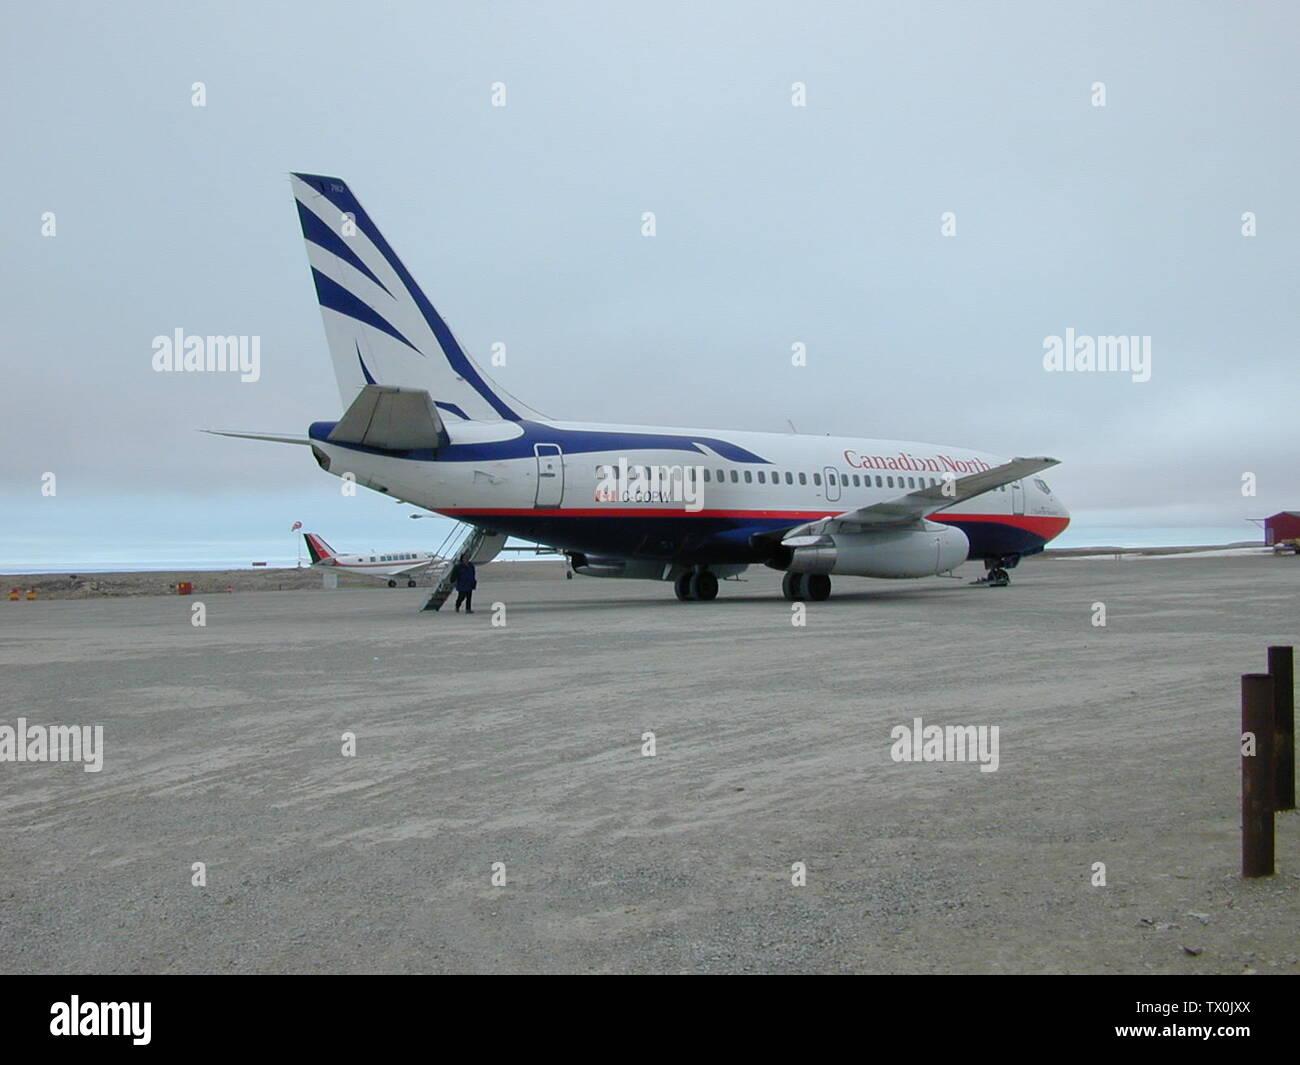 'English: Air Norterra Inc (Canadian North) Boeing 737-275C (B732) (C-GOPW). Picture taken 17th June 1999 at 13:14 MDT (17th June 1999 19:14Z) at Cambridge Bay Airport, Nunavut, Canada; 17 June 1999; Own work; CambridgeBayWeather; ' - Stock Image